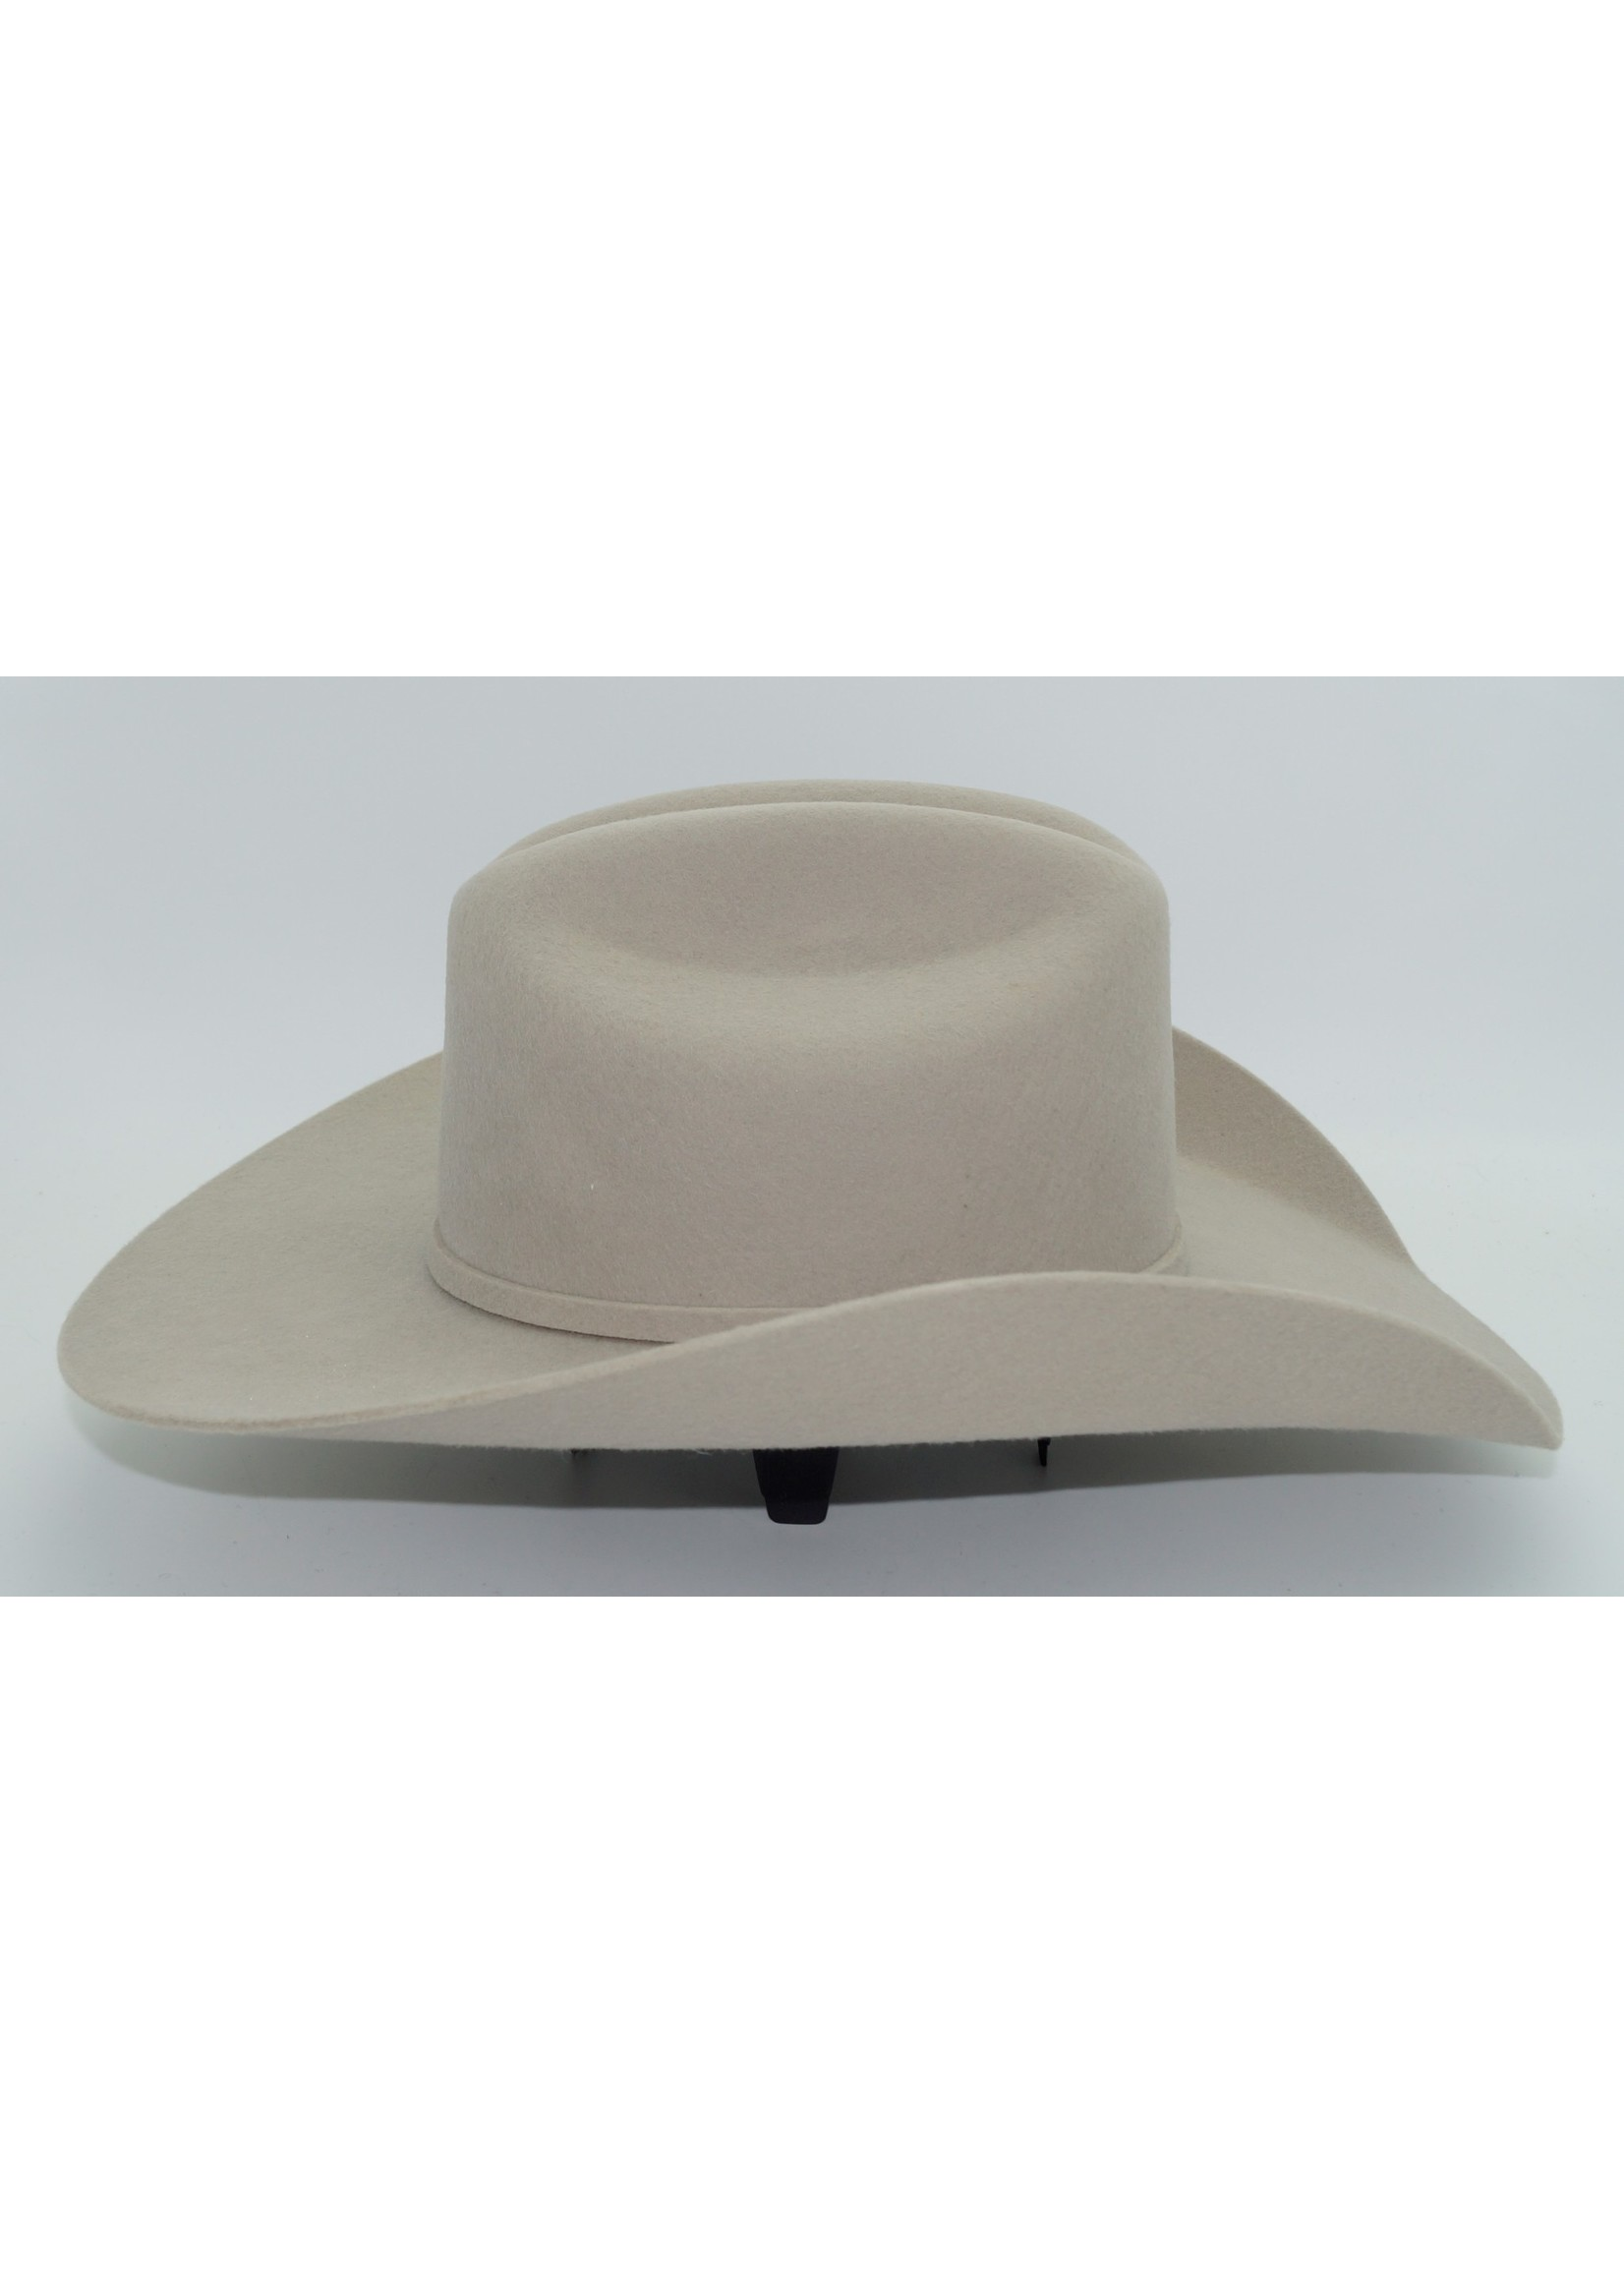 M&F Twister Dallas Western Hat Silver Belly